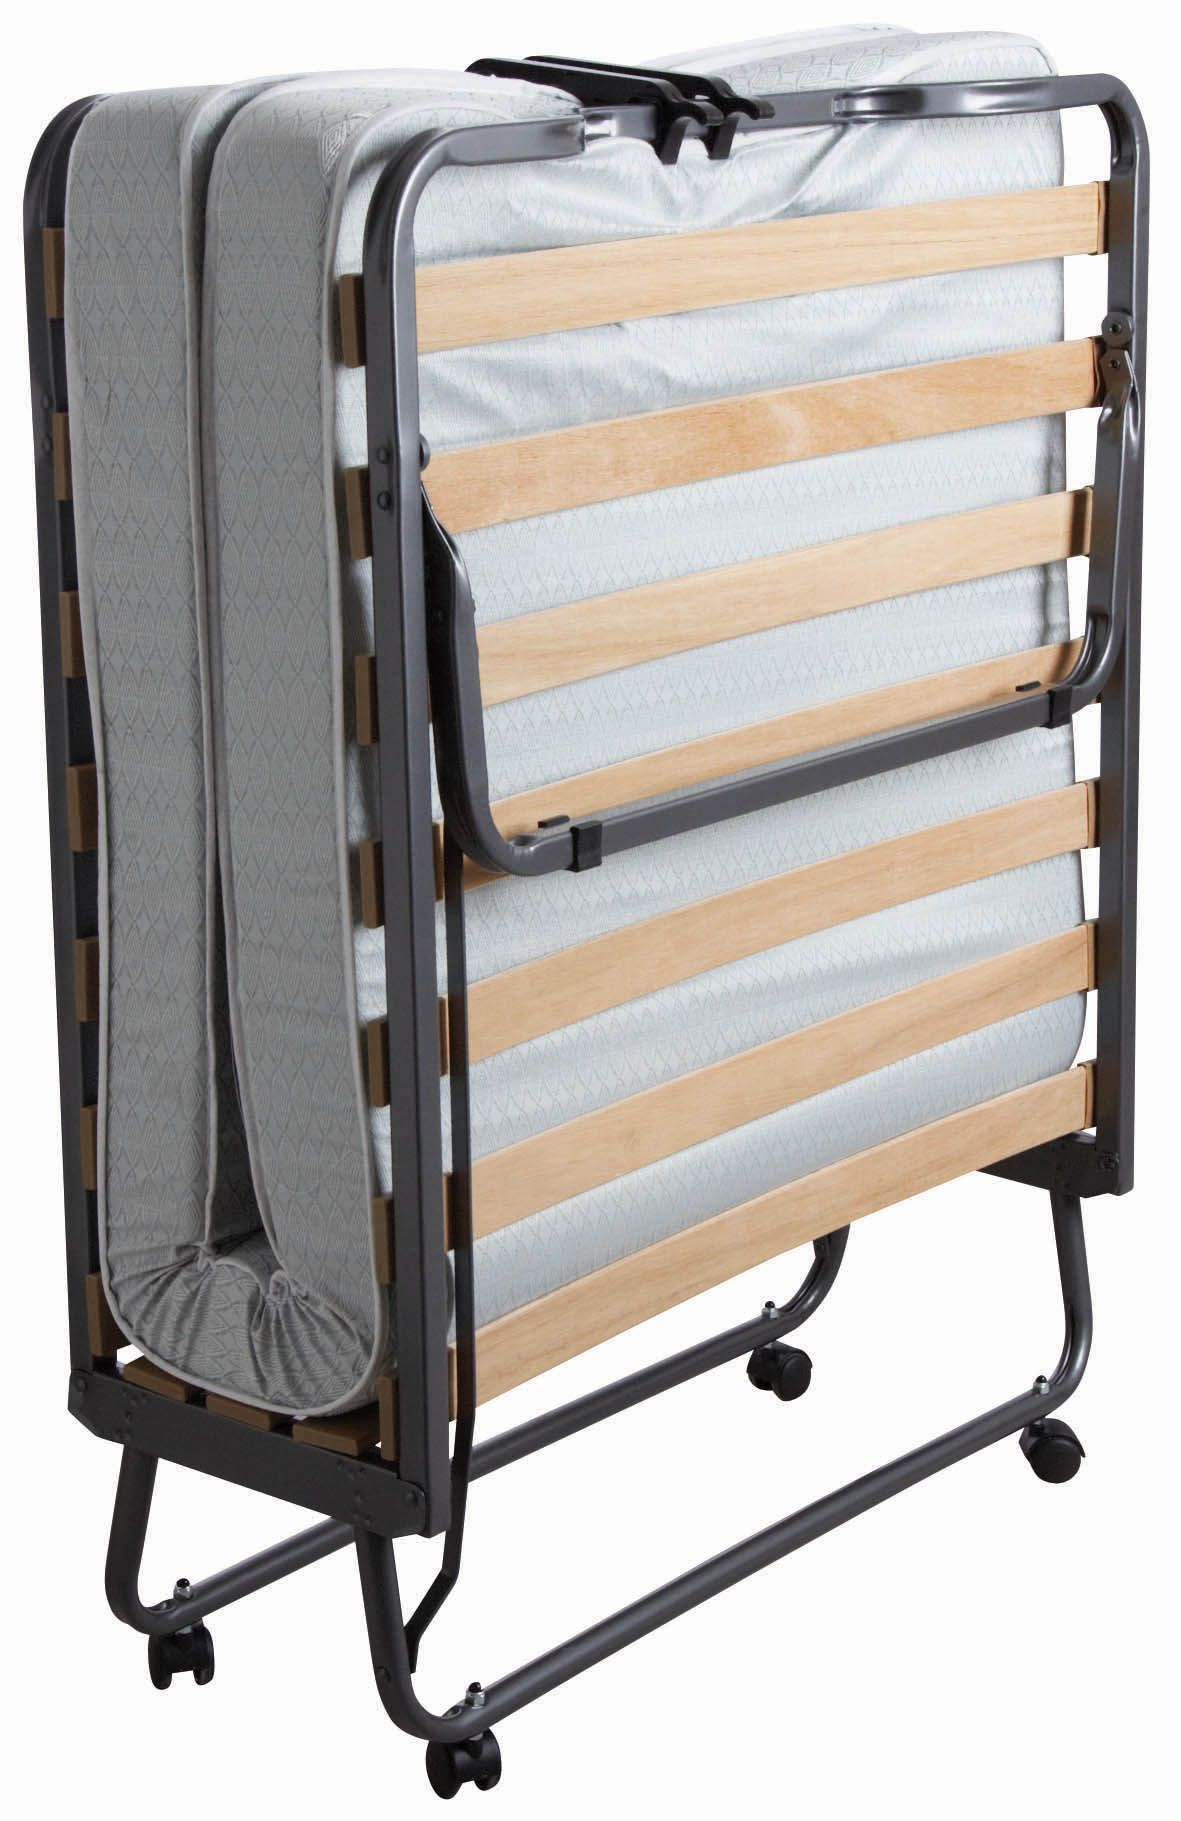 lit d 39 appoint pliant luxor. Black Bedroom Furniture Sets. Home Design Ideas